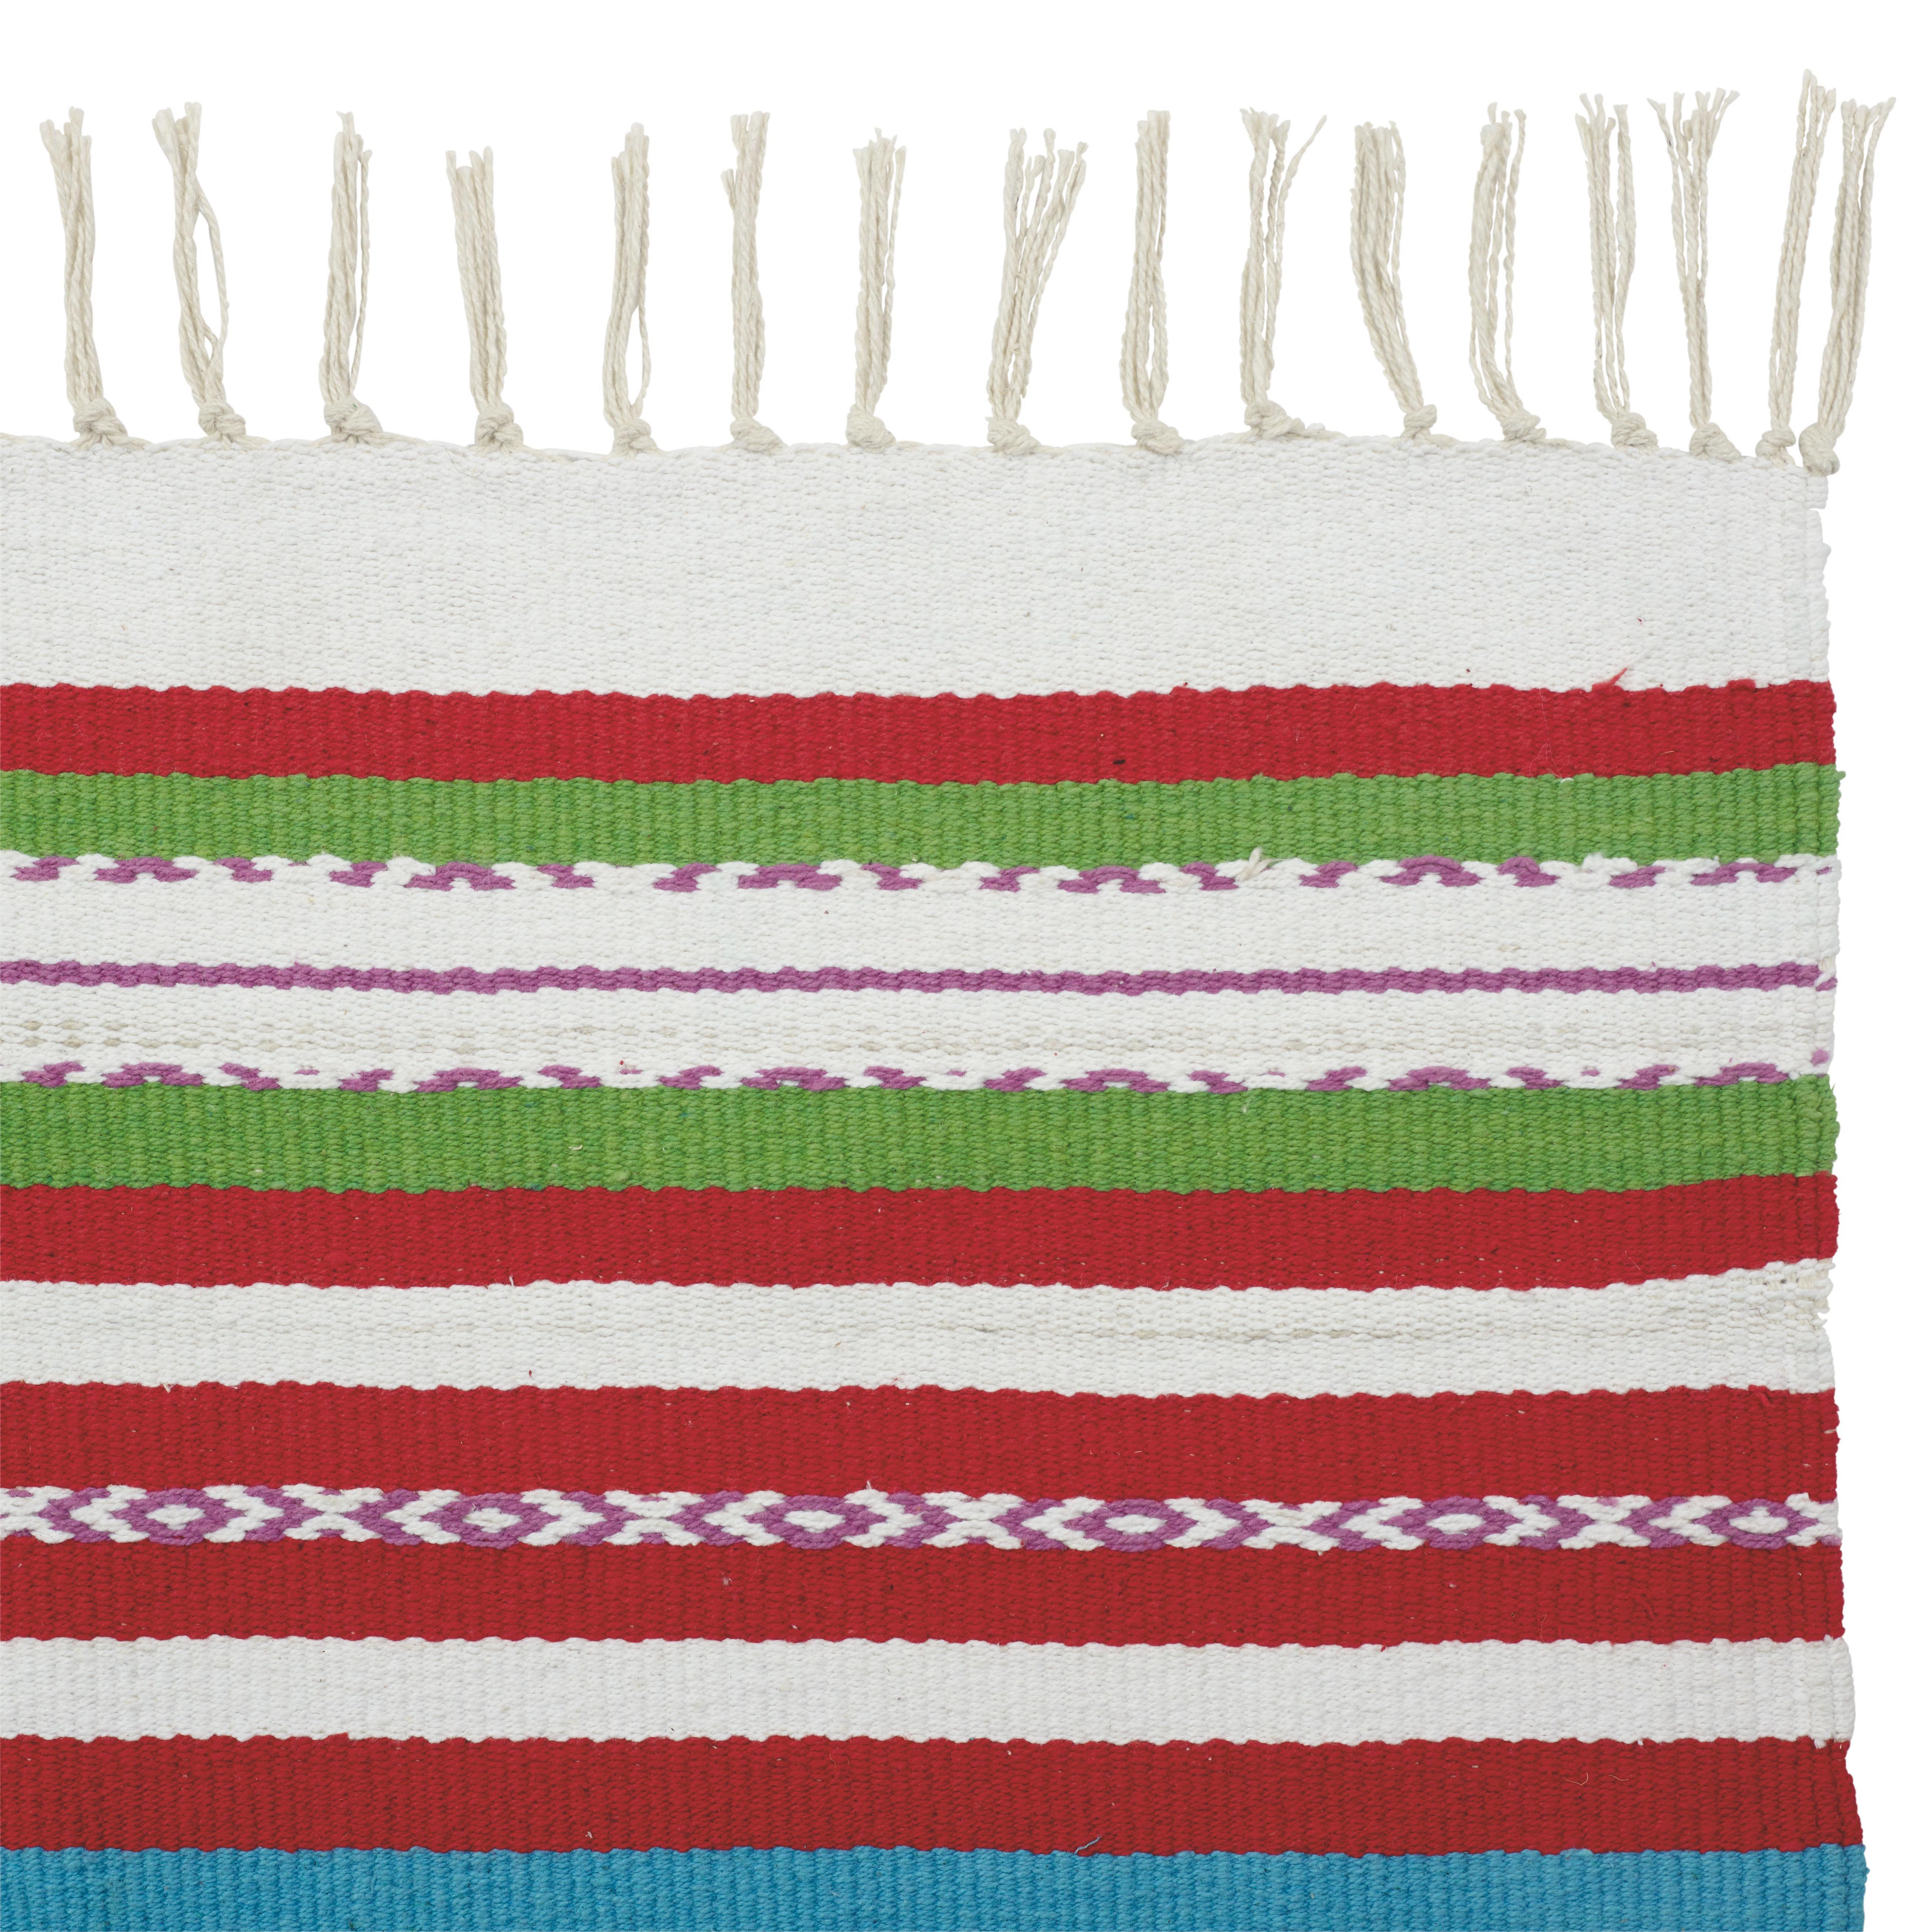 Handwebteppich Marani 70x140 cm - Multicolor, Textil (70/140cm) - MÖMAX modern living